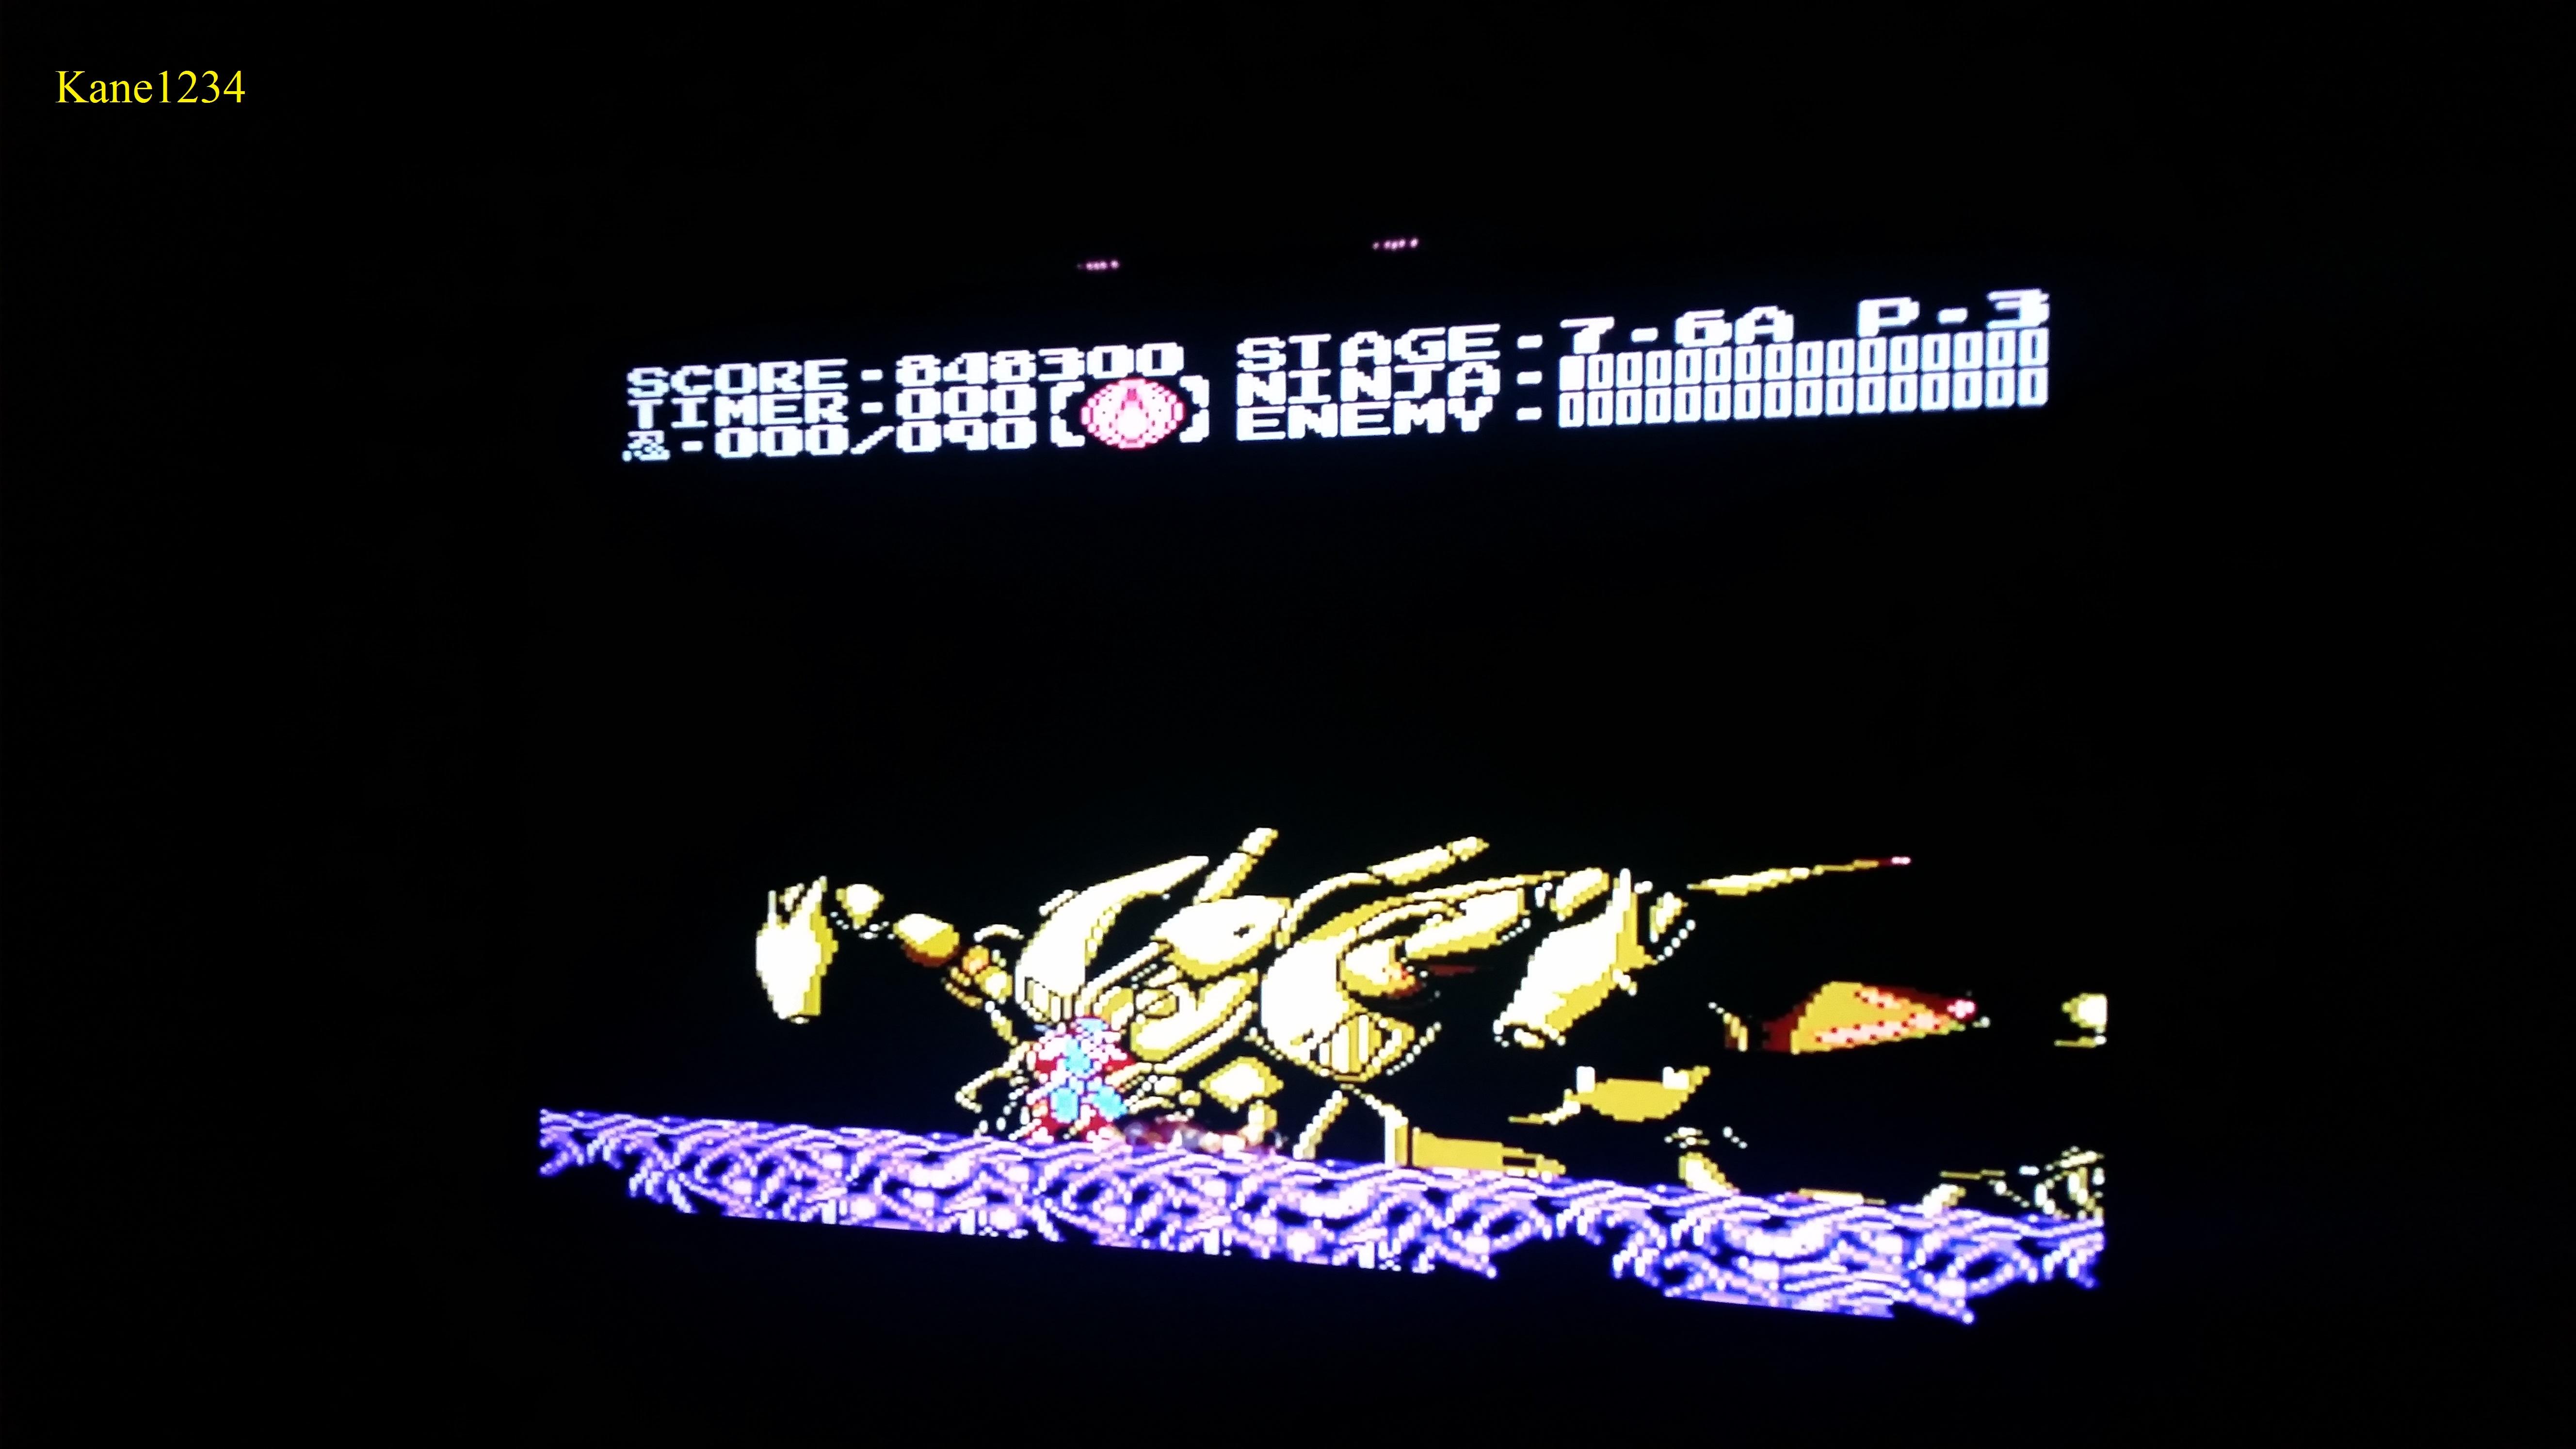 Ninja Gaiden III: The Ancient Ship of Doom 848,300 points